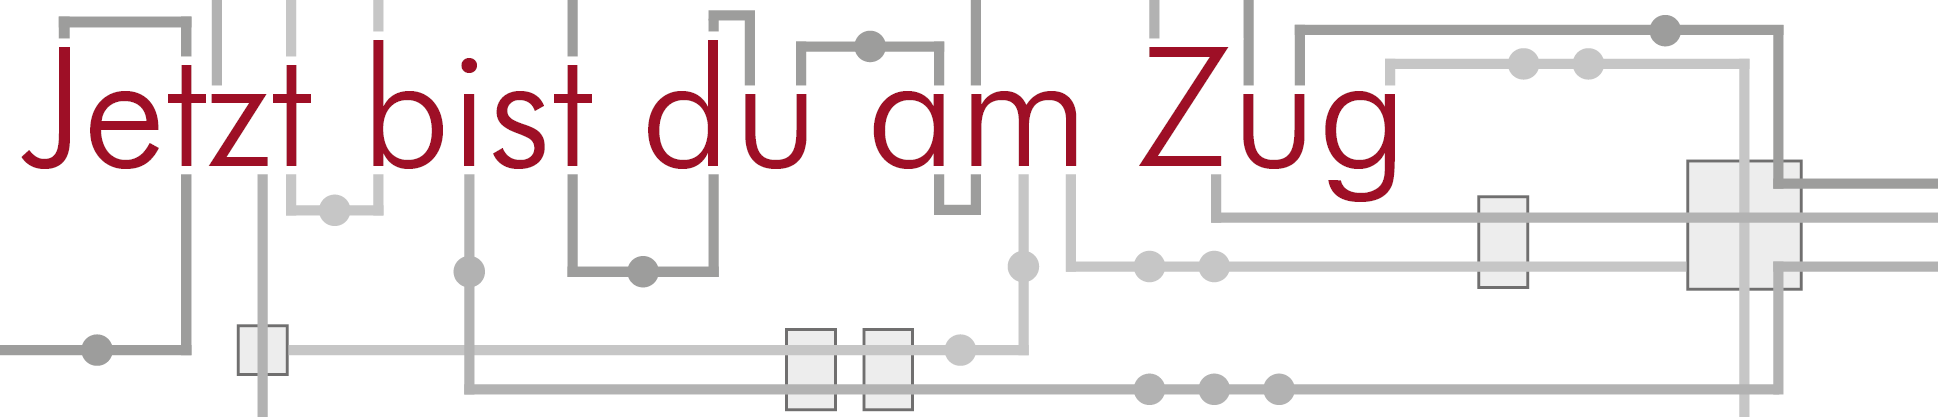 Du hast Angewandte Informatik oder Angewandte Mathematik studiert? Dann bist du am Zug: Bewirb dich bei uns!